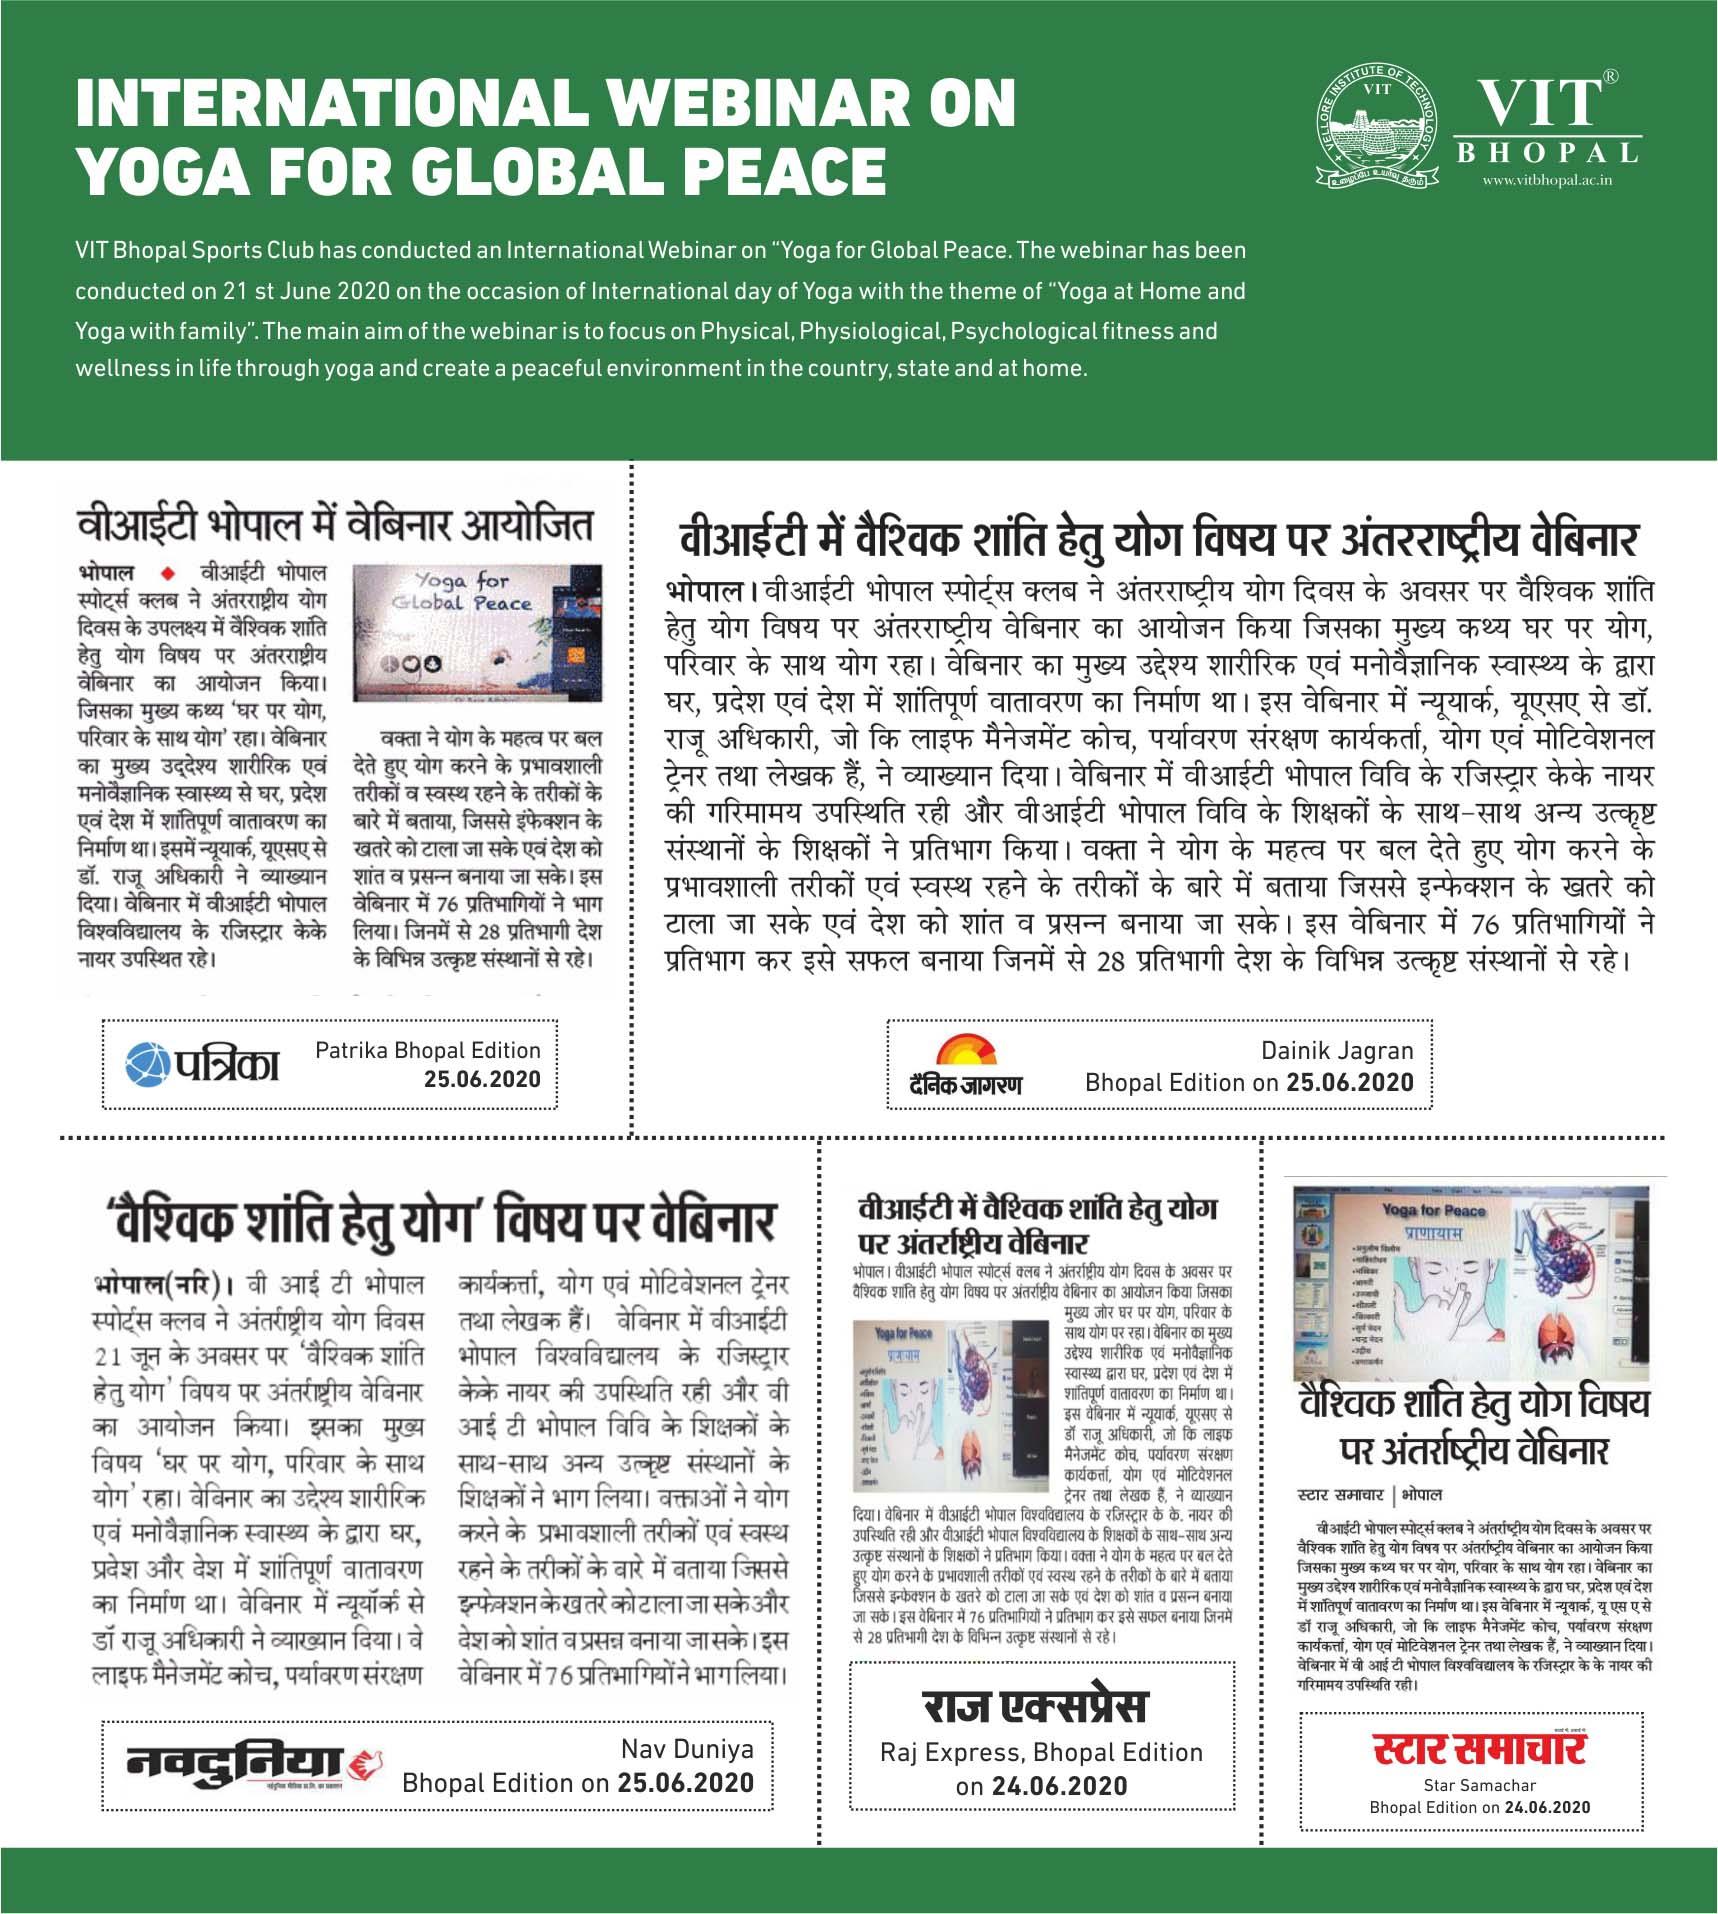 VIT Bhopal  - Best University in Central India -  World-Yoga-Day-Webinar-PR-collage